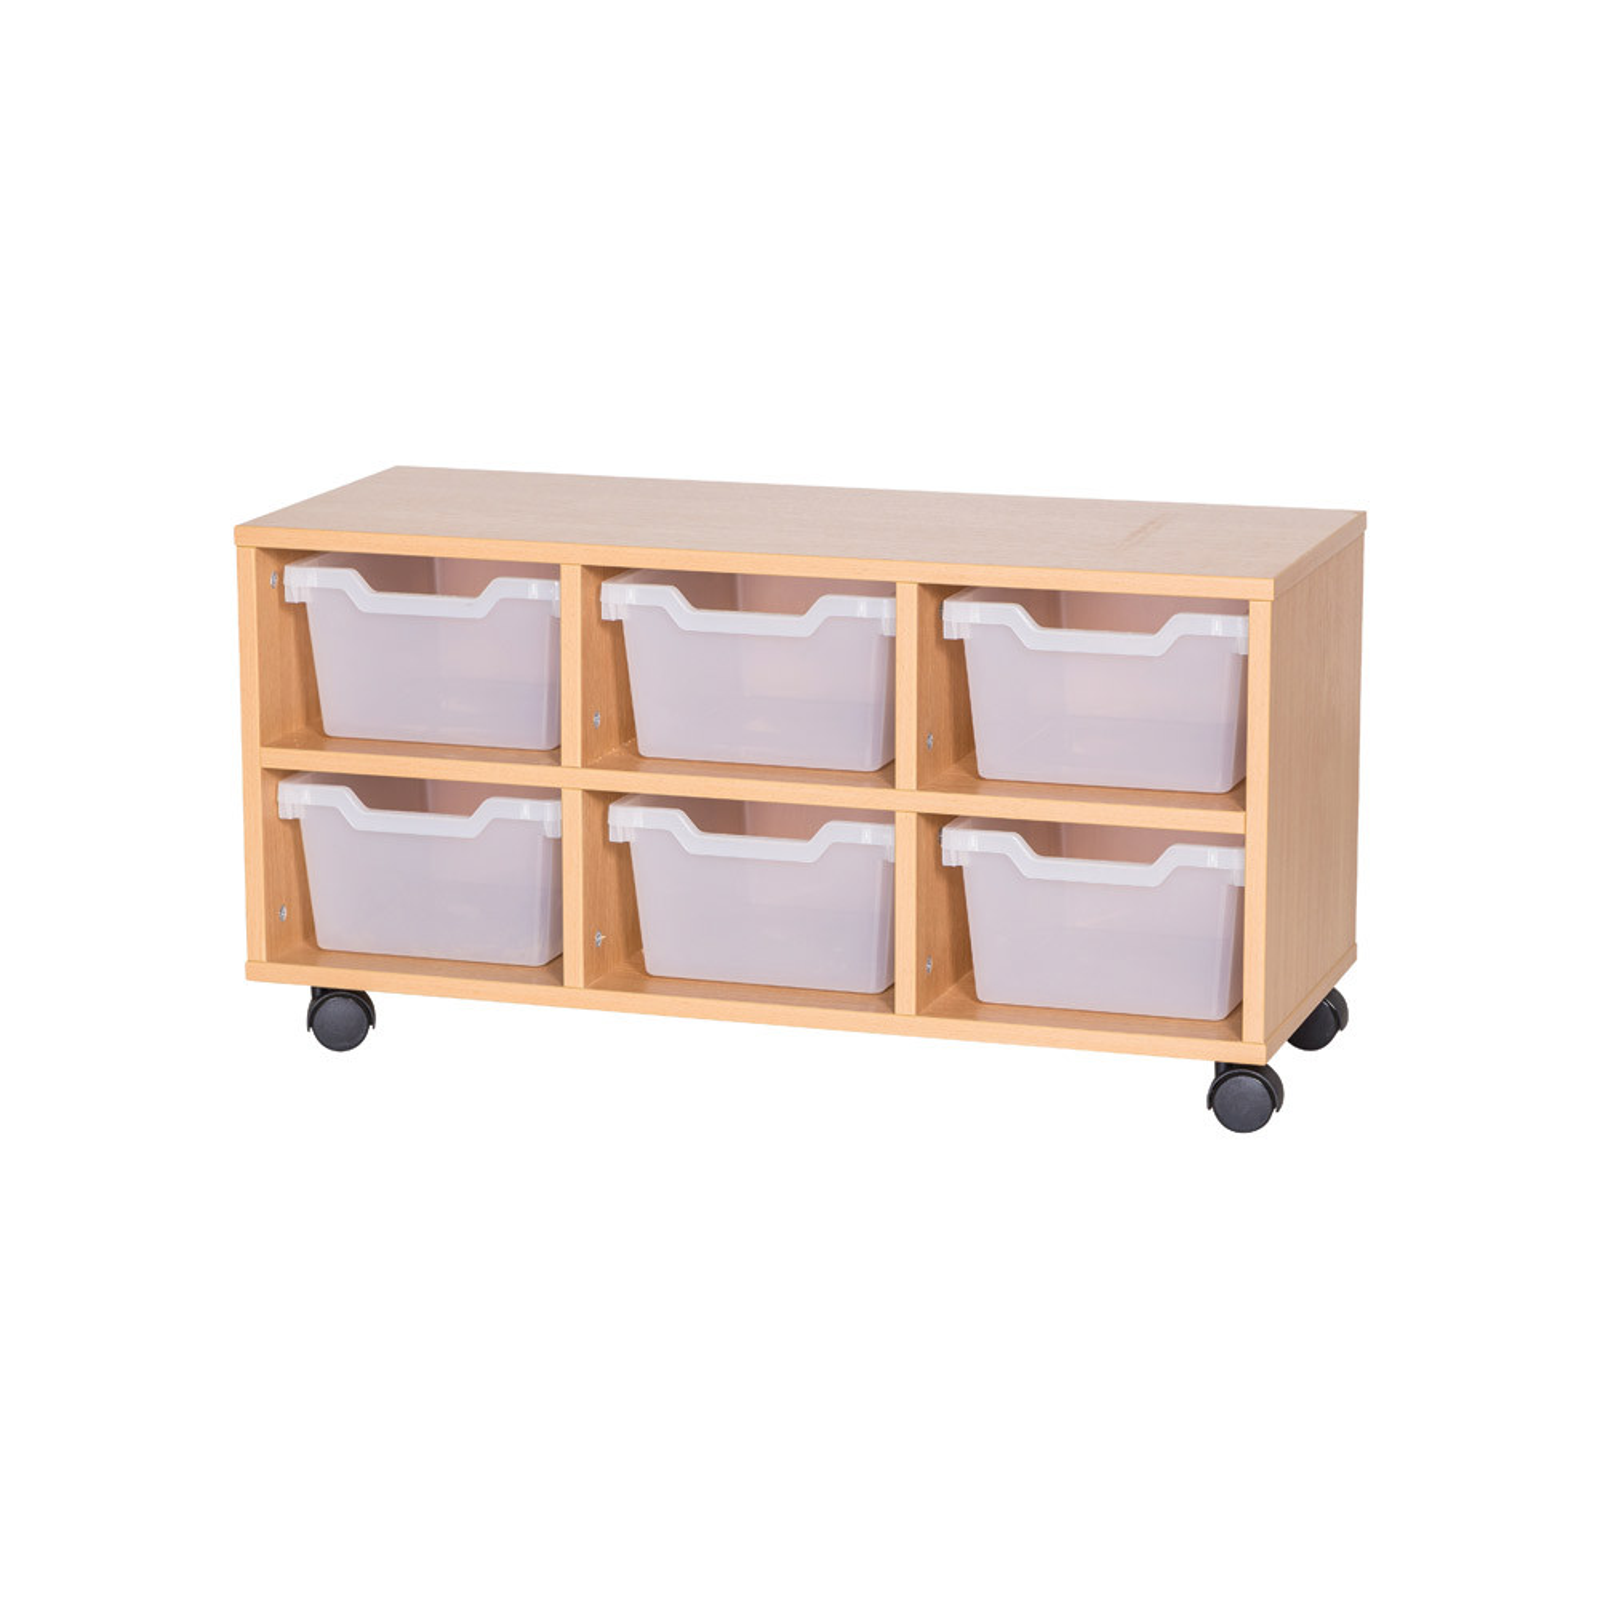 Cubby Tray Storage: 2 Tier with 6 Trays